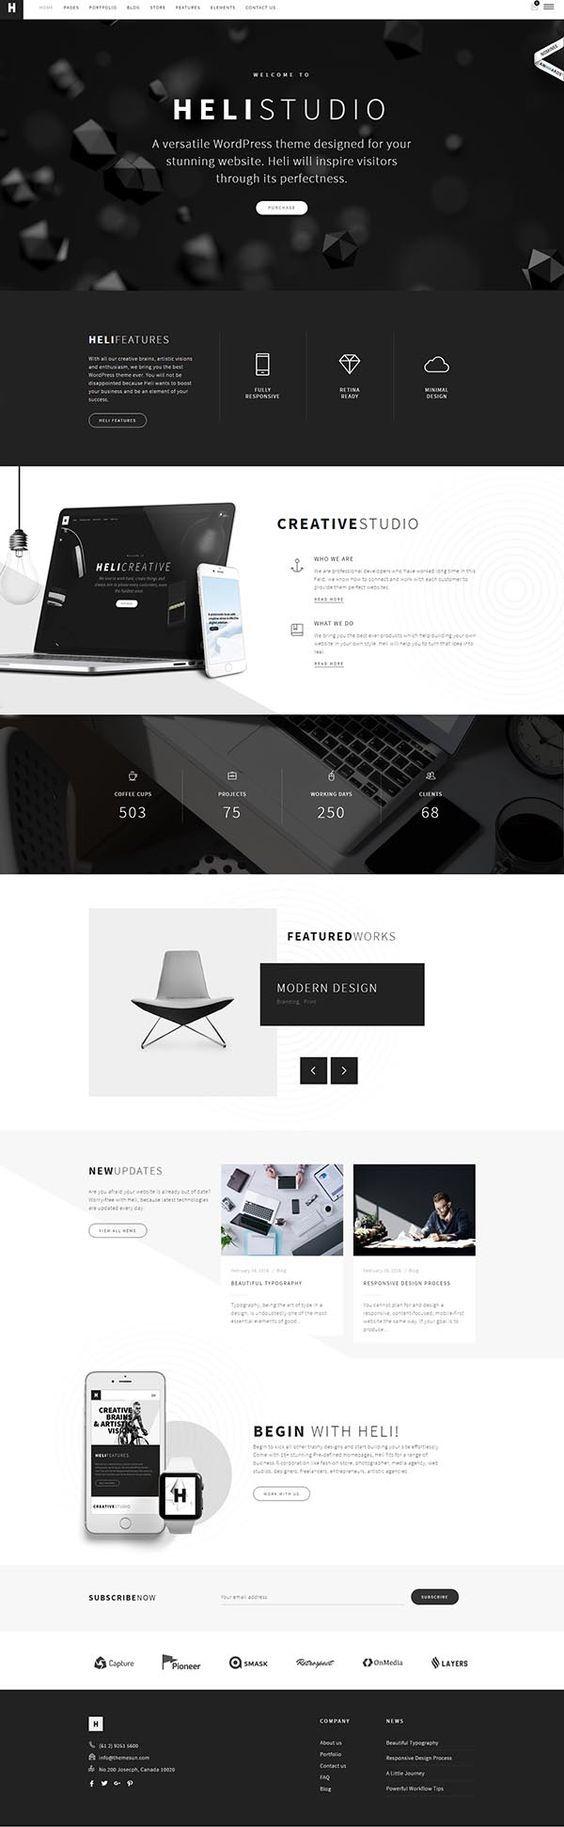 Heli - Creative Multi-Purpose WordPress Theme by ThemeMove